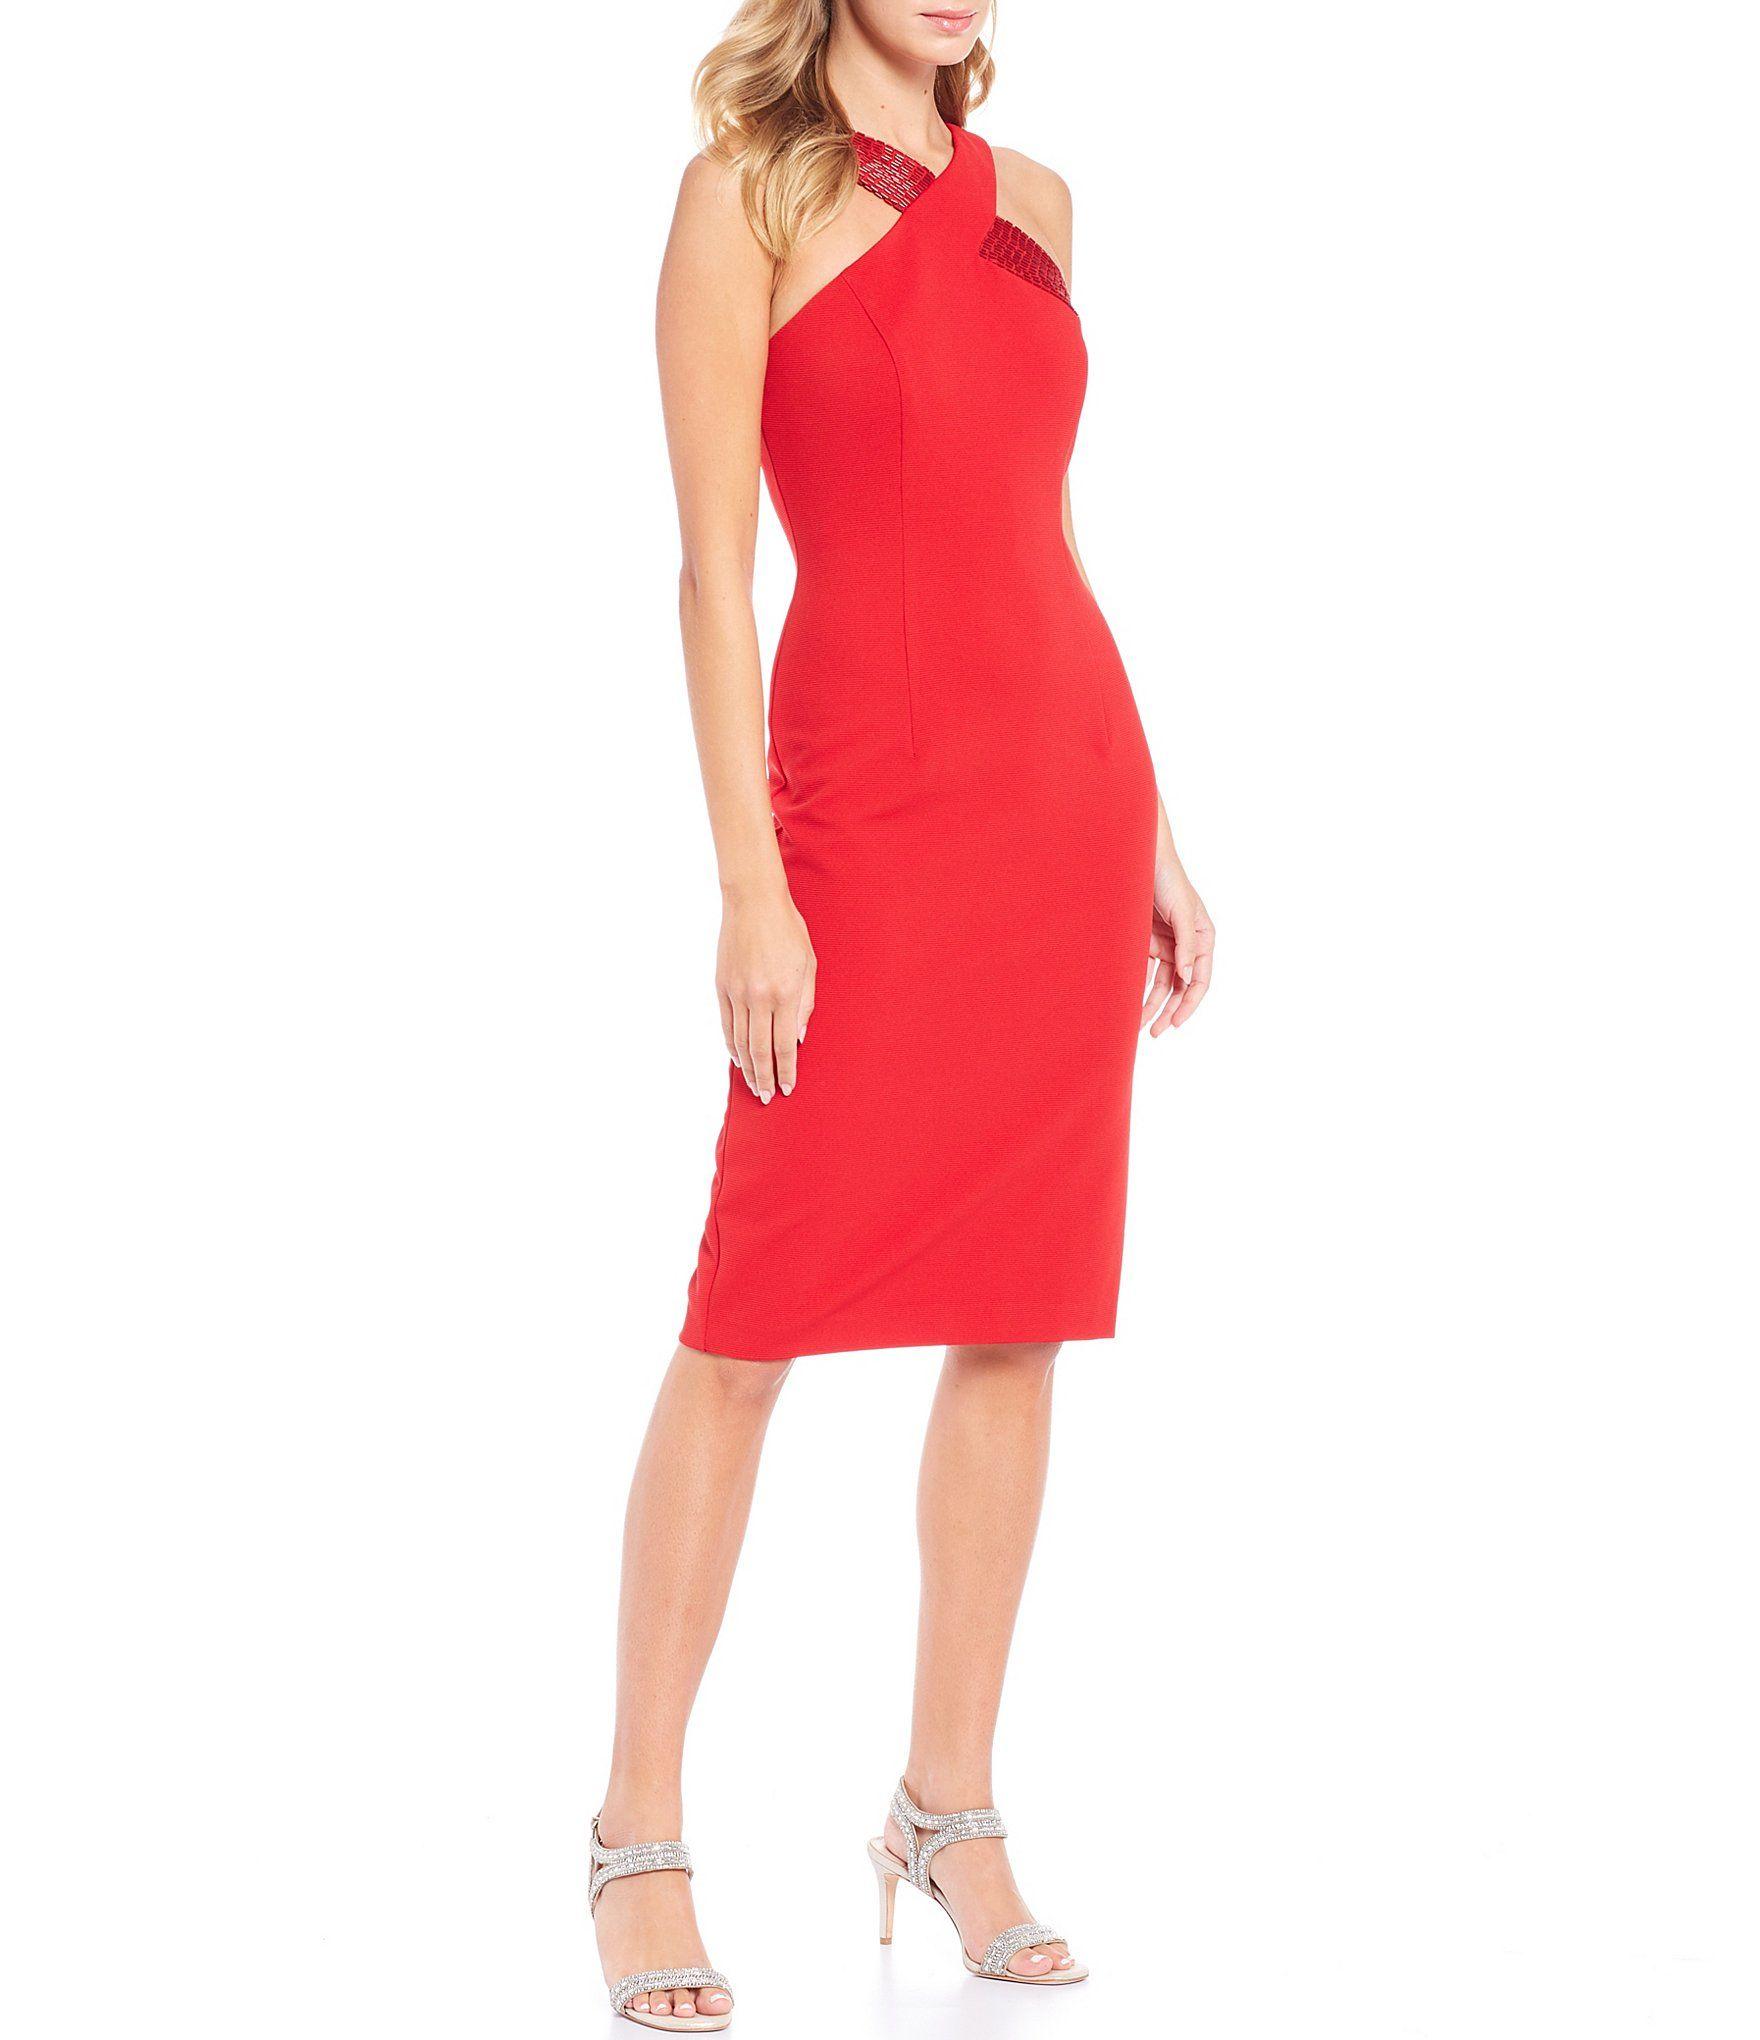 Adrianna Papell Beaded Halter Ottoman Knit Square Back Cocktail Dress | Dillard's